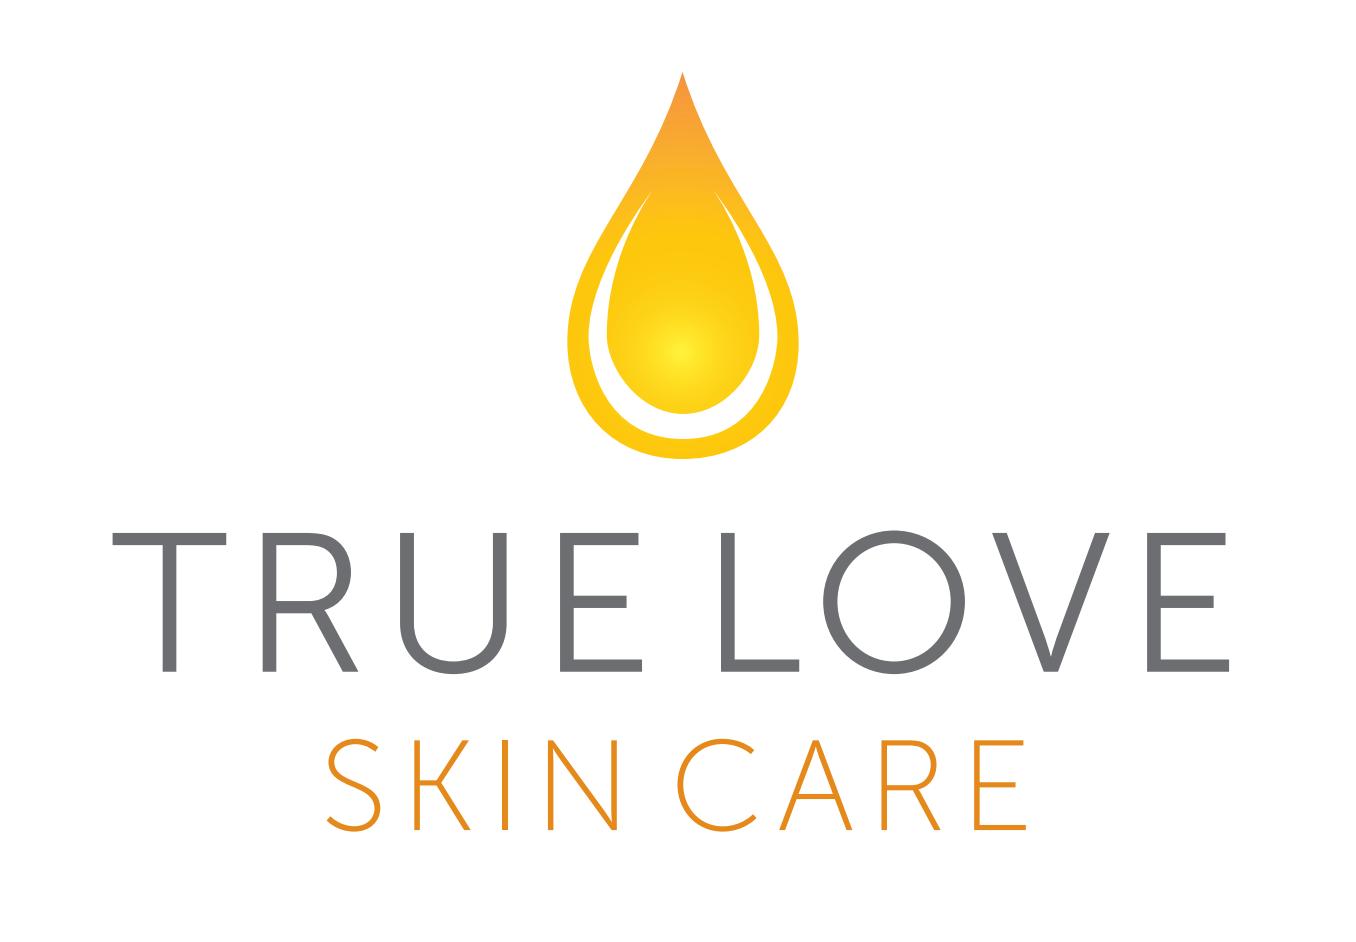 True Love Skincare